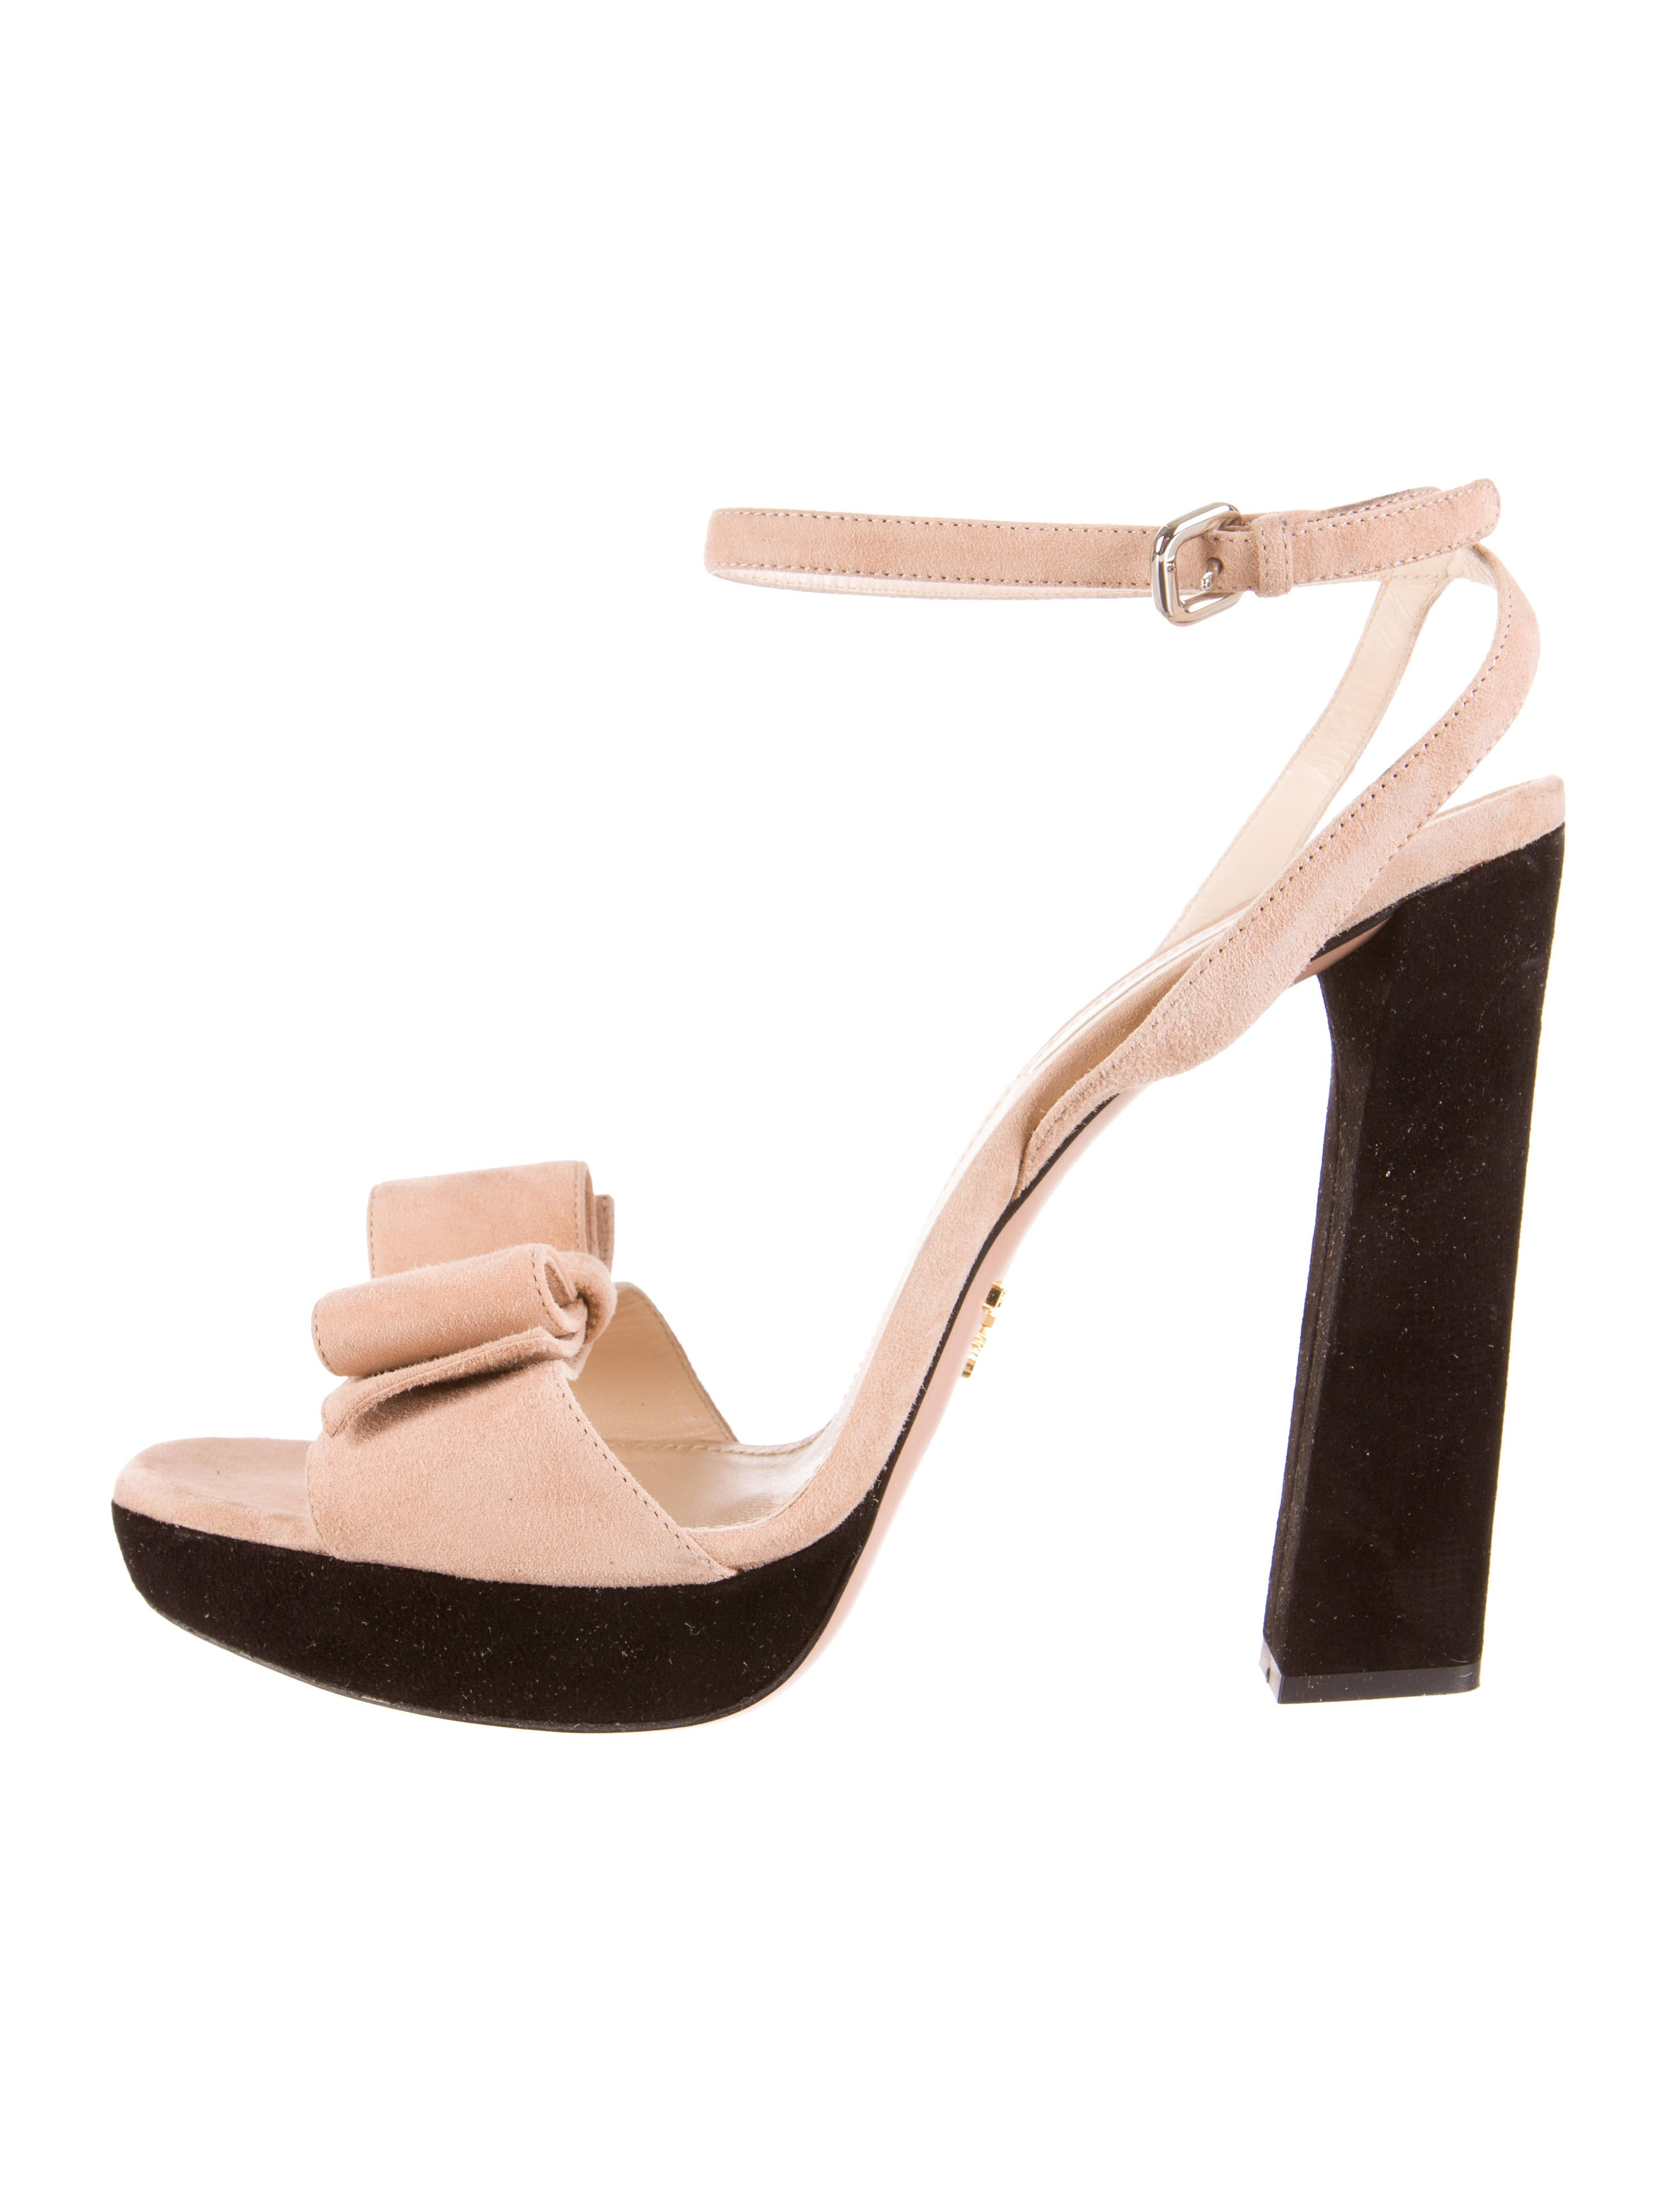 Wonderful Prada Shoes For Women Burgundy Patent Leather 3I4605 PRW58